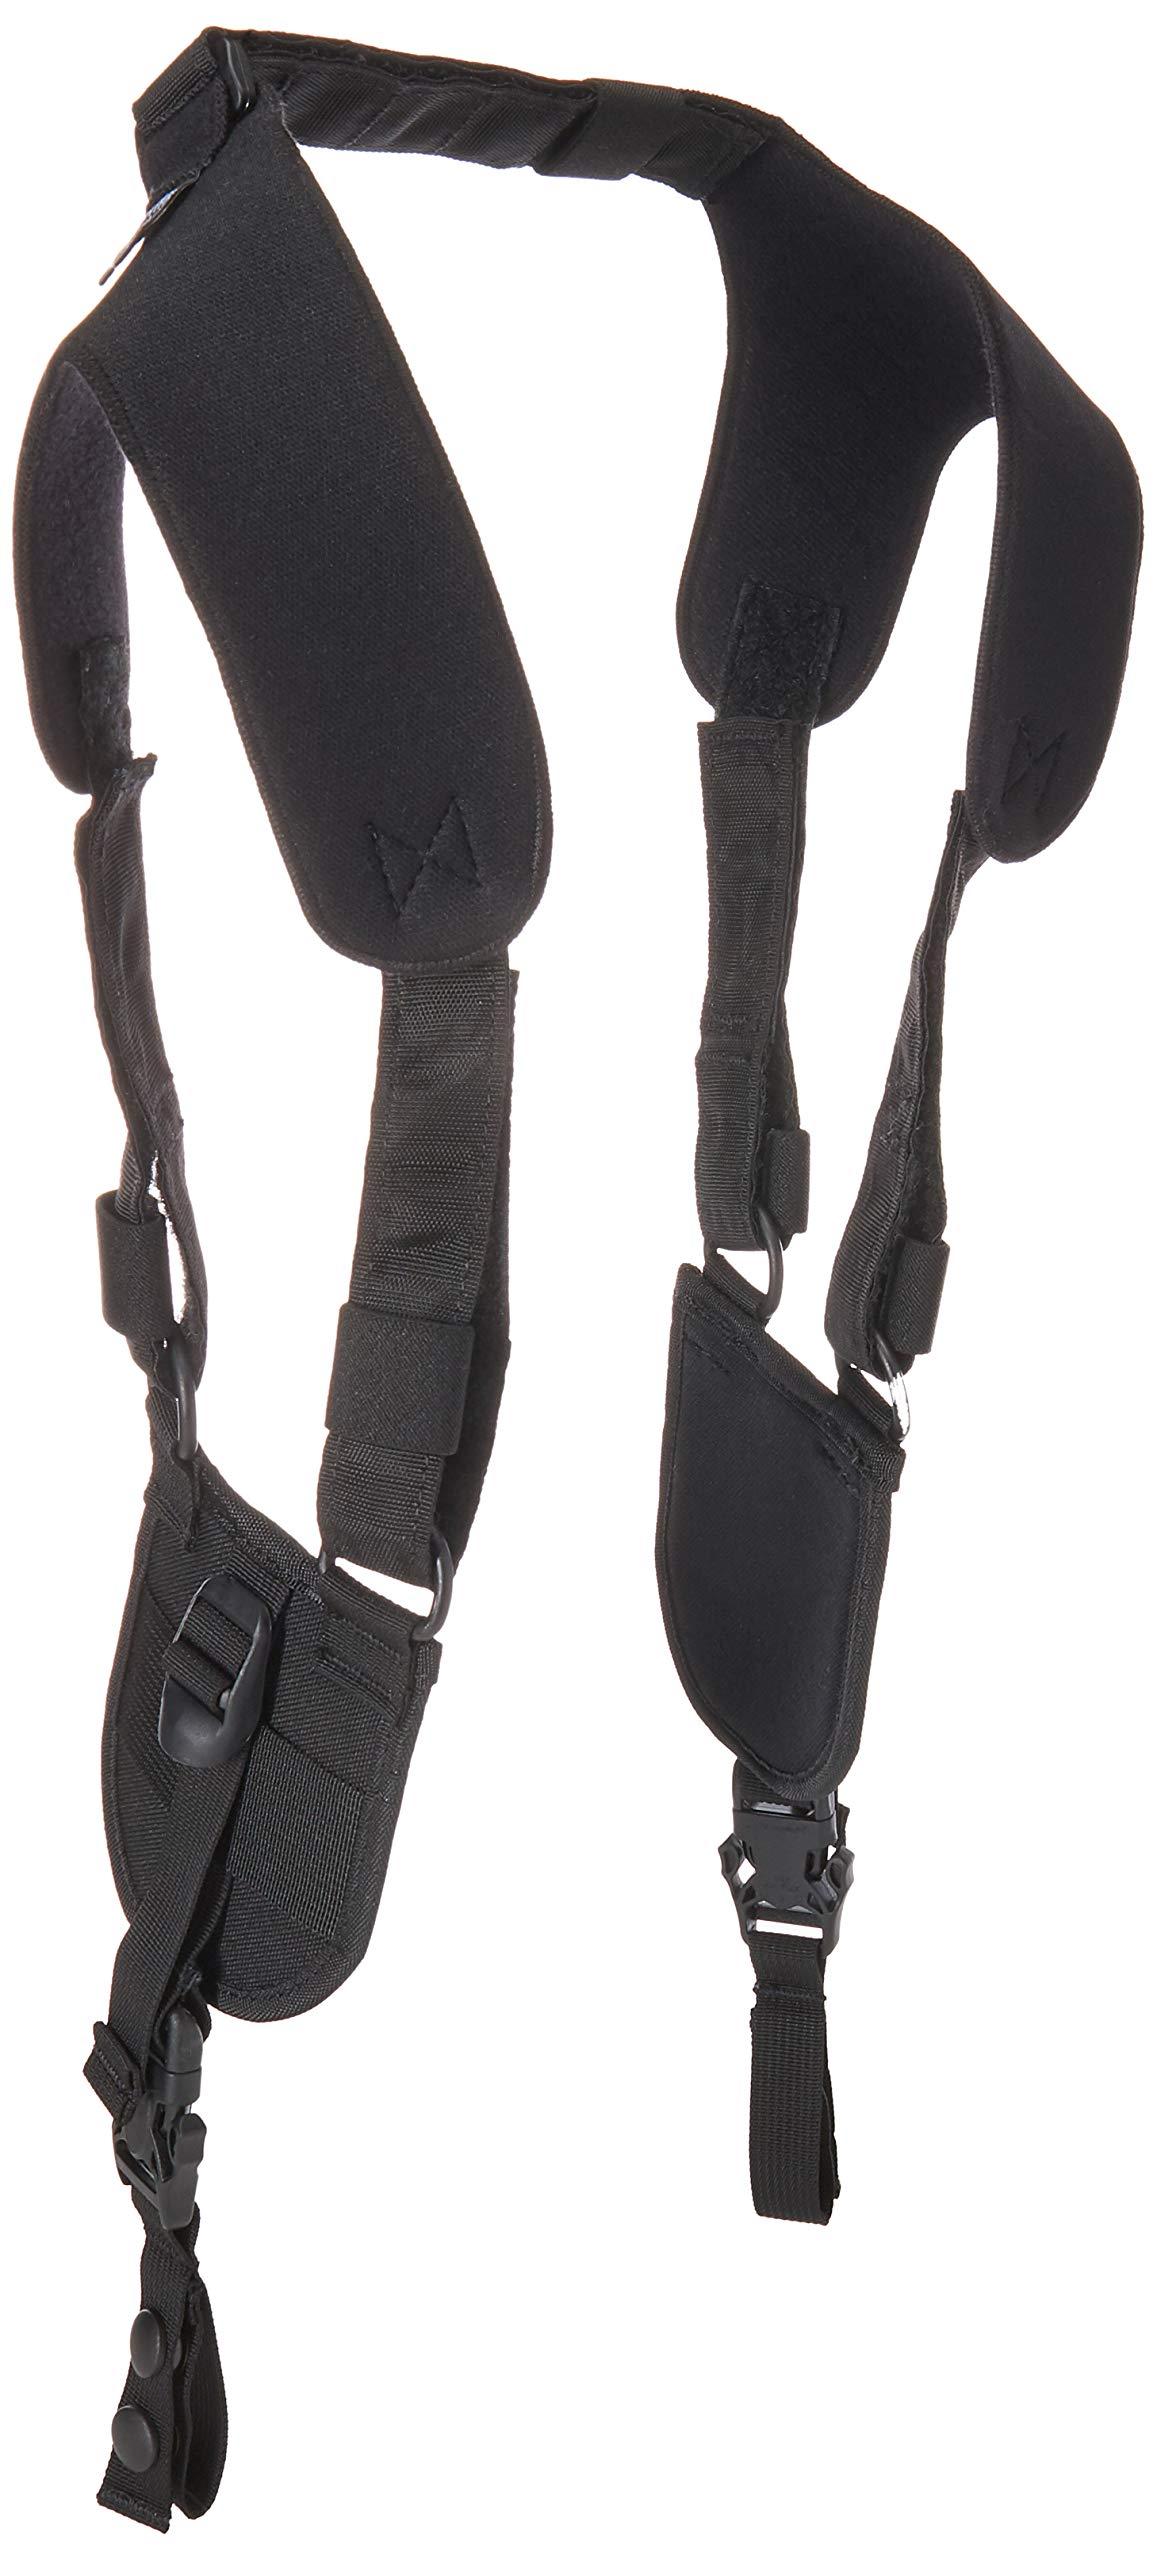 BLACKHAWK! Ergonomic Black Duty Belt Harness - Small/Medium by BLACKHAWK!